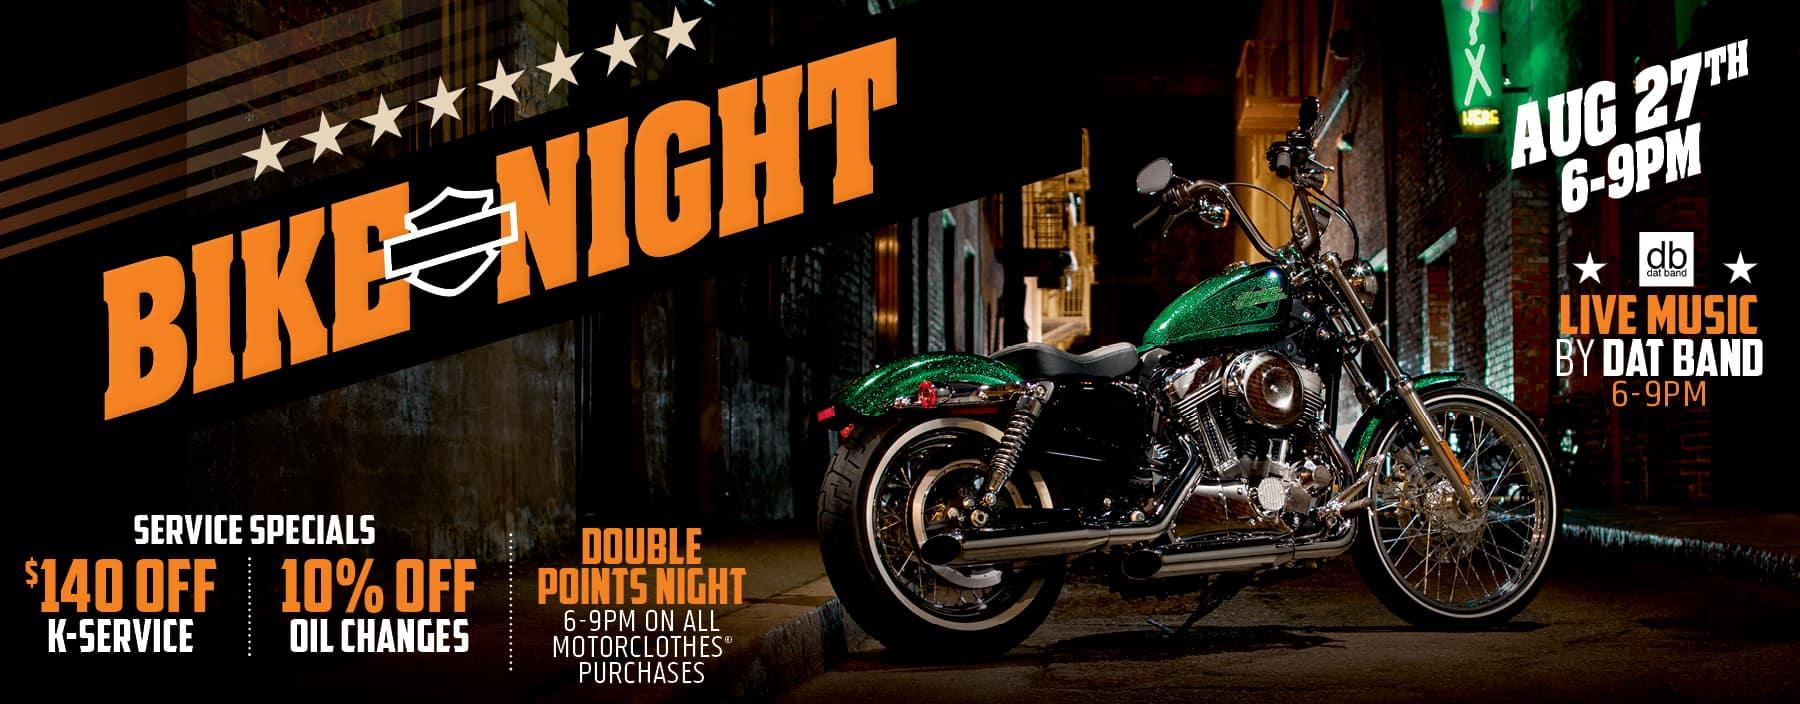 OH01_08_21_Bike_Night_1800x704_FB_Cvr